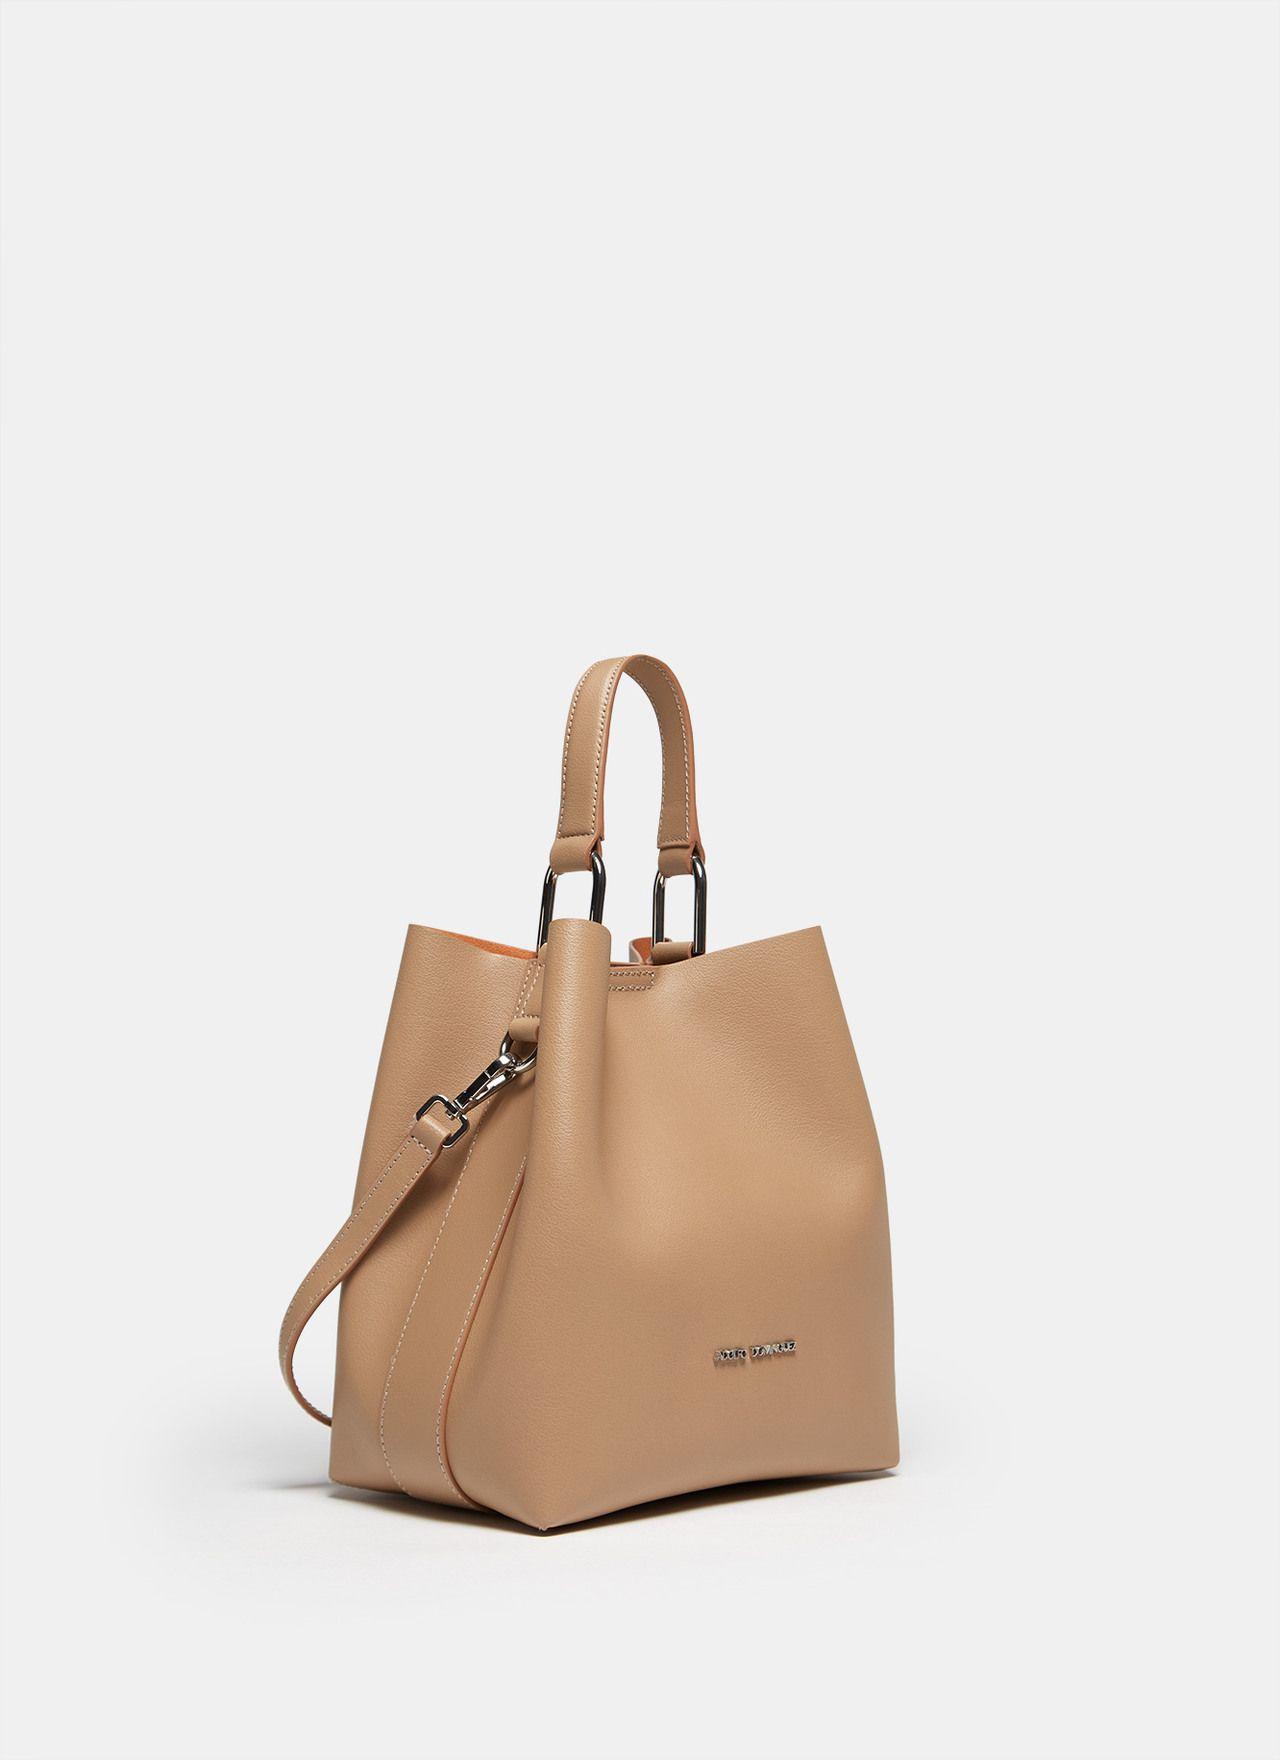 a592a8d93 Bolso cubo de piel vaqueta - Para ella | Adolfo Dominguez shop online